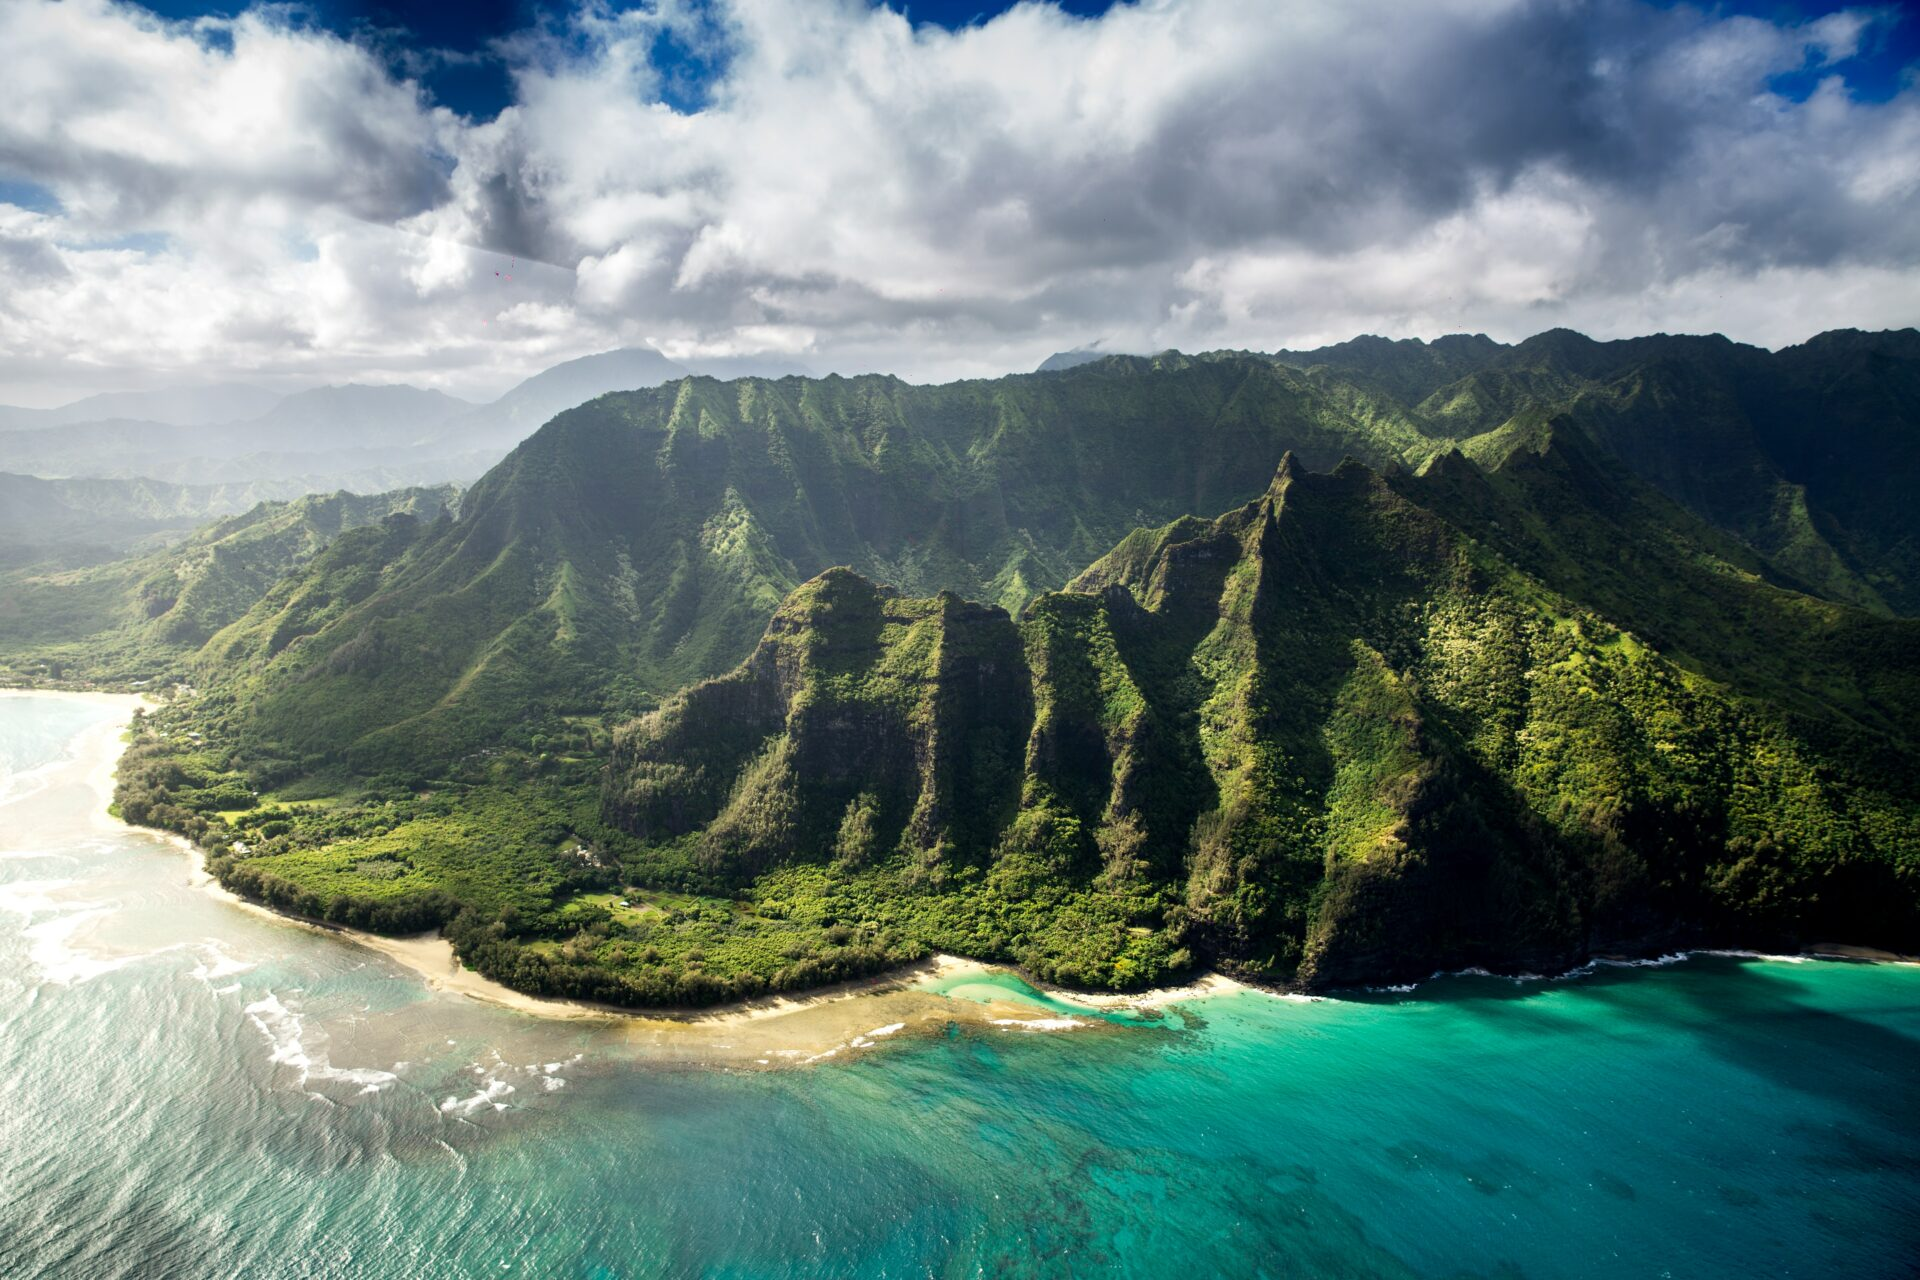 HAWAII BANS CHEMICAL SUNSCREEN